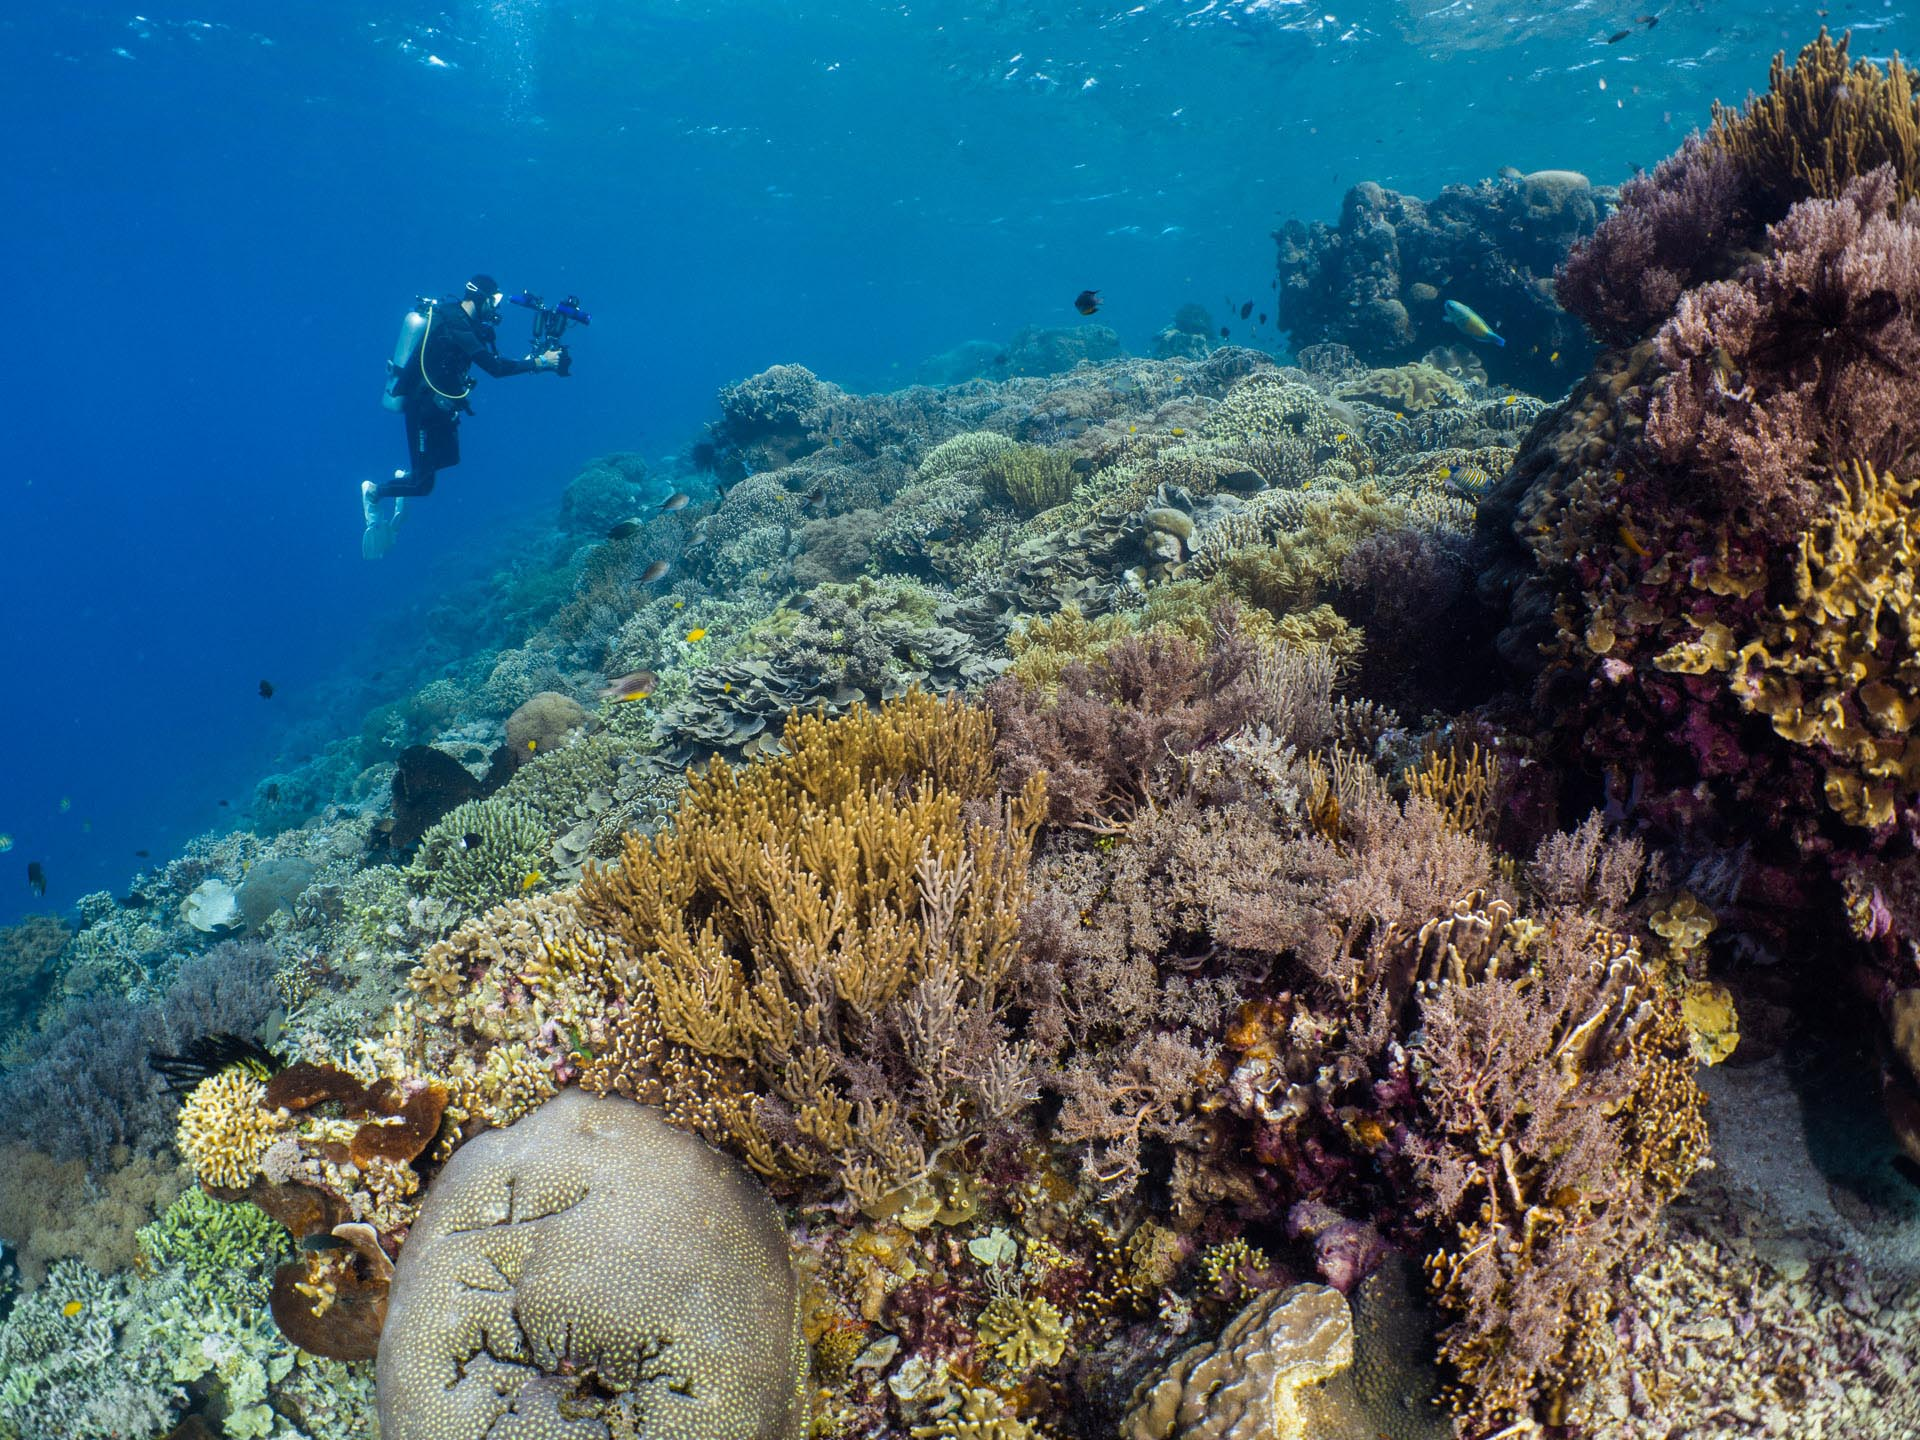 scubadiver filming coral reef